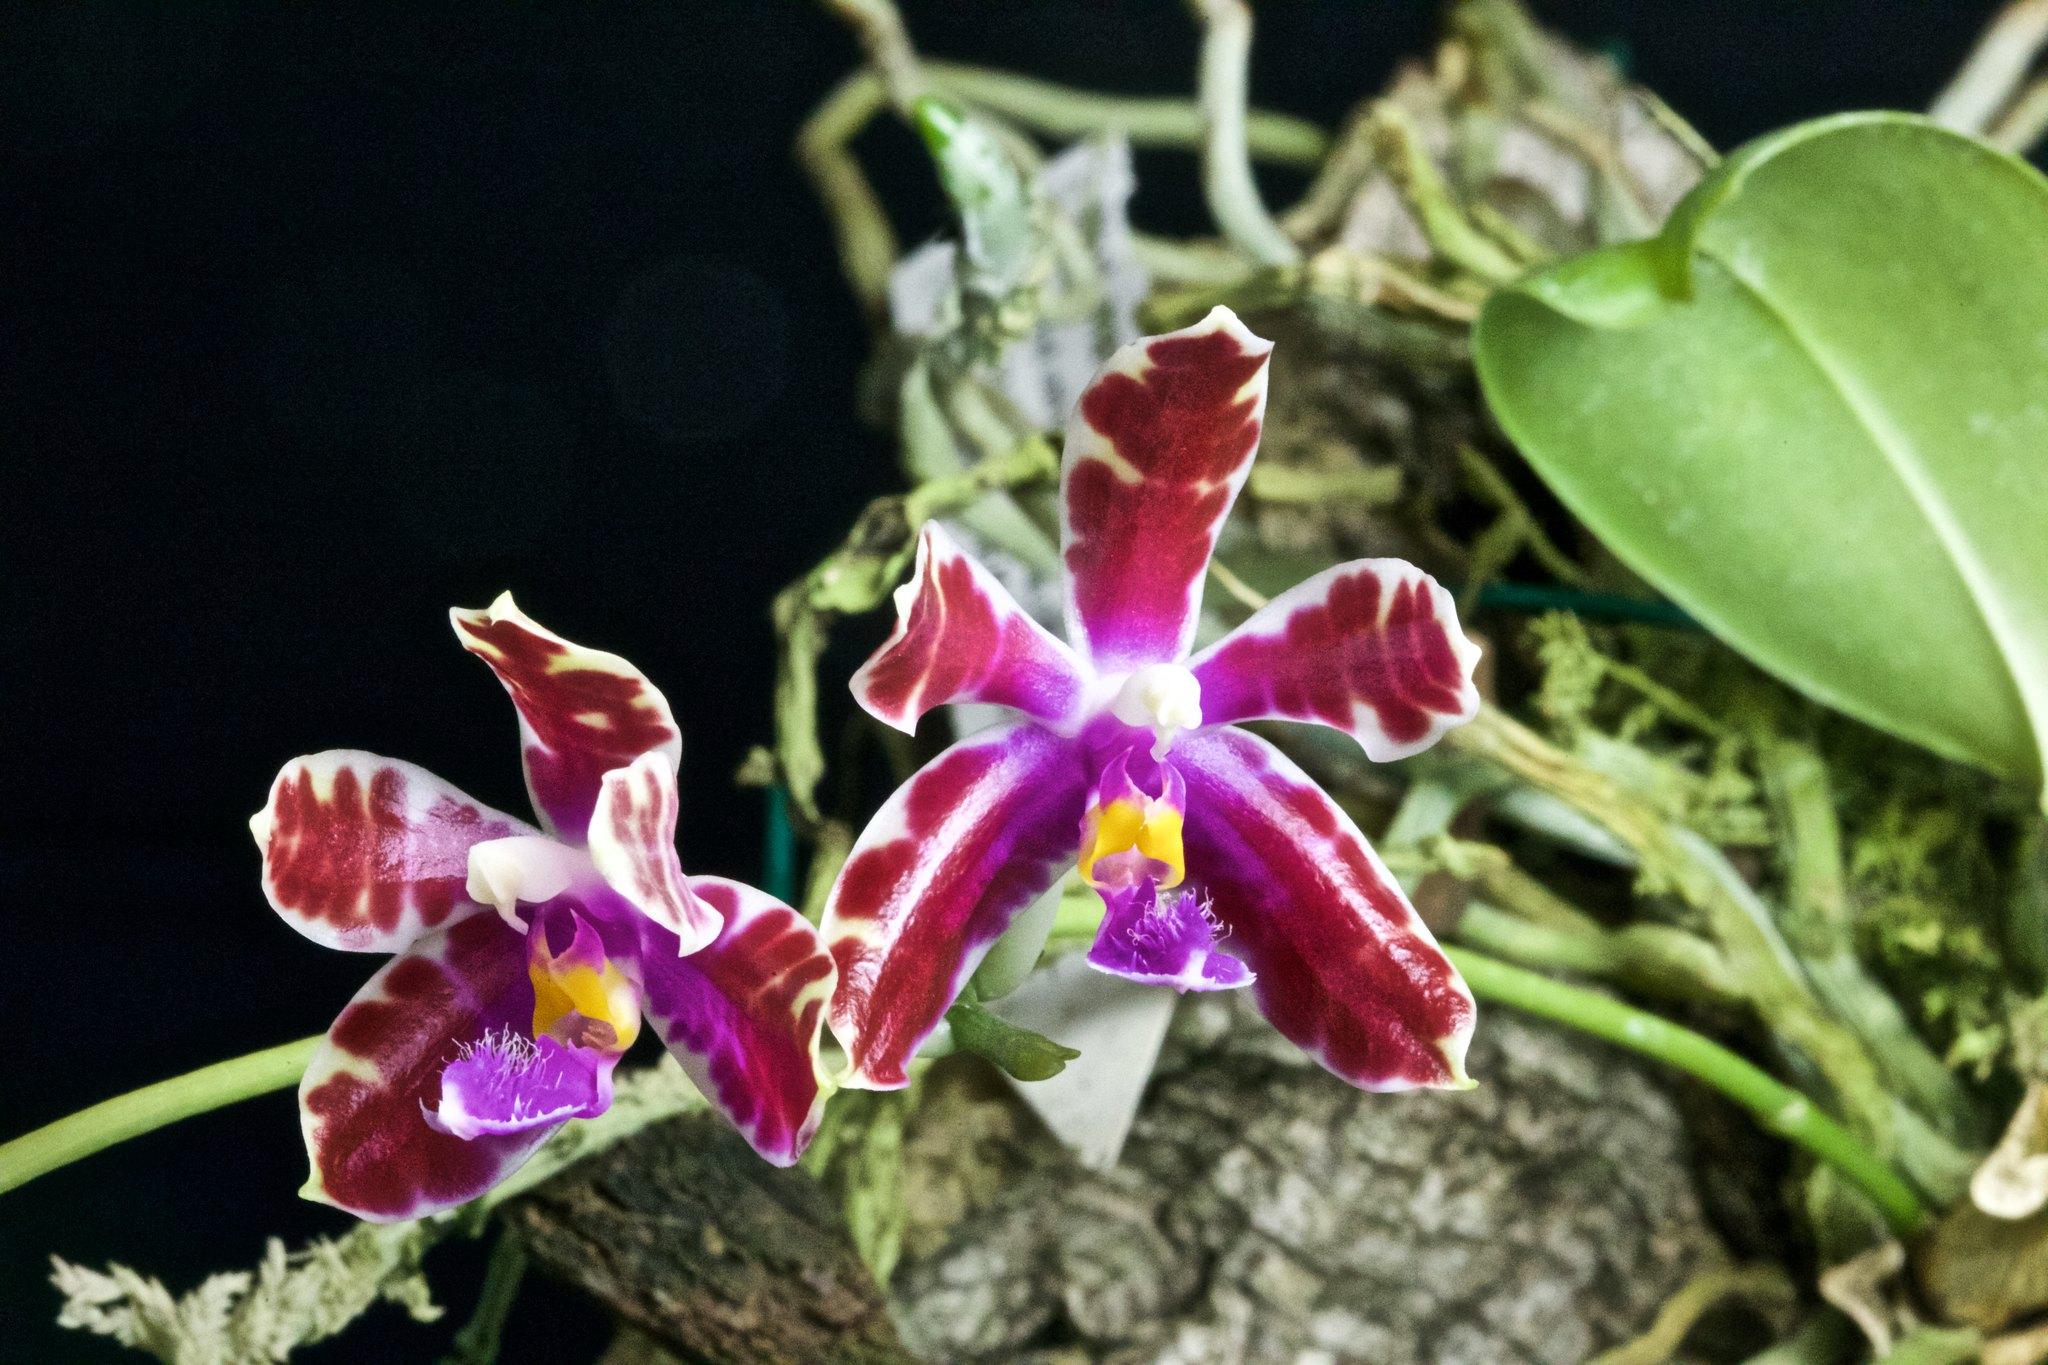 Phalaenopsis mariae x pulchra 20206562570_9dc2d6b05b_k